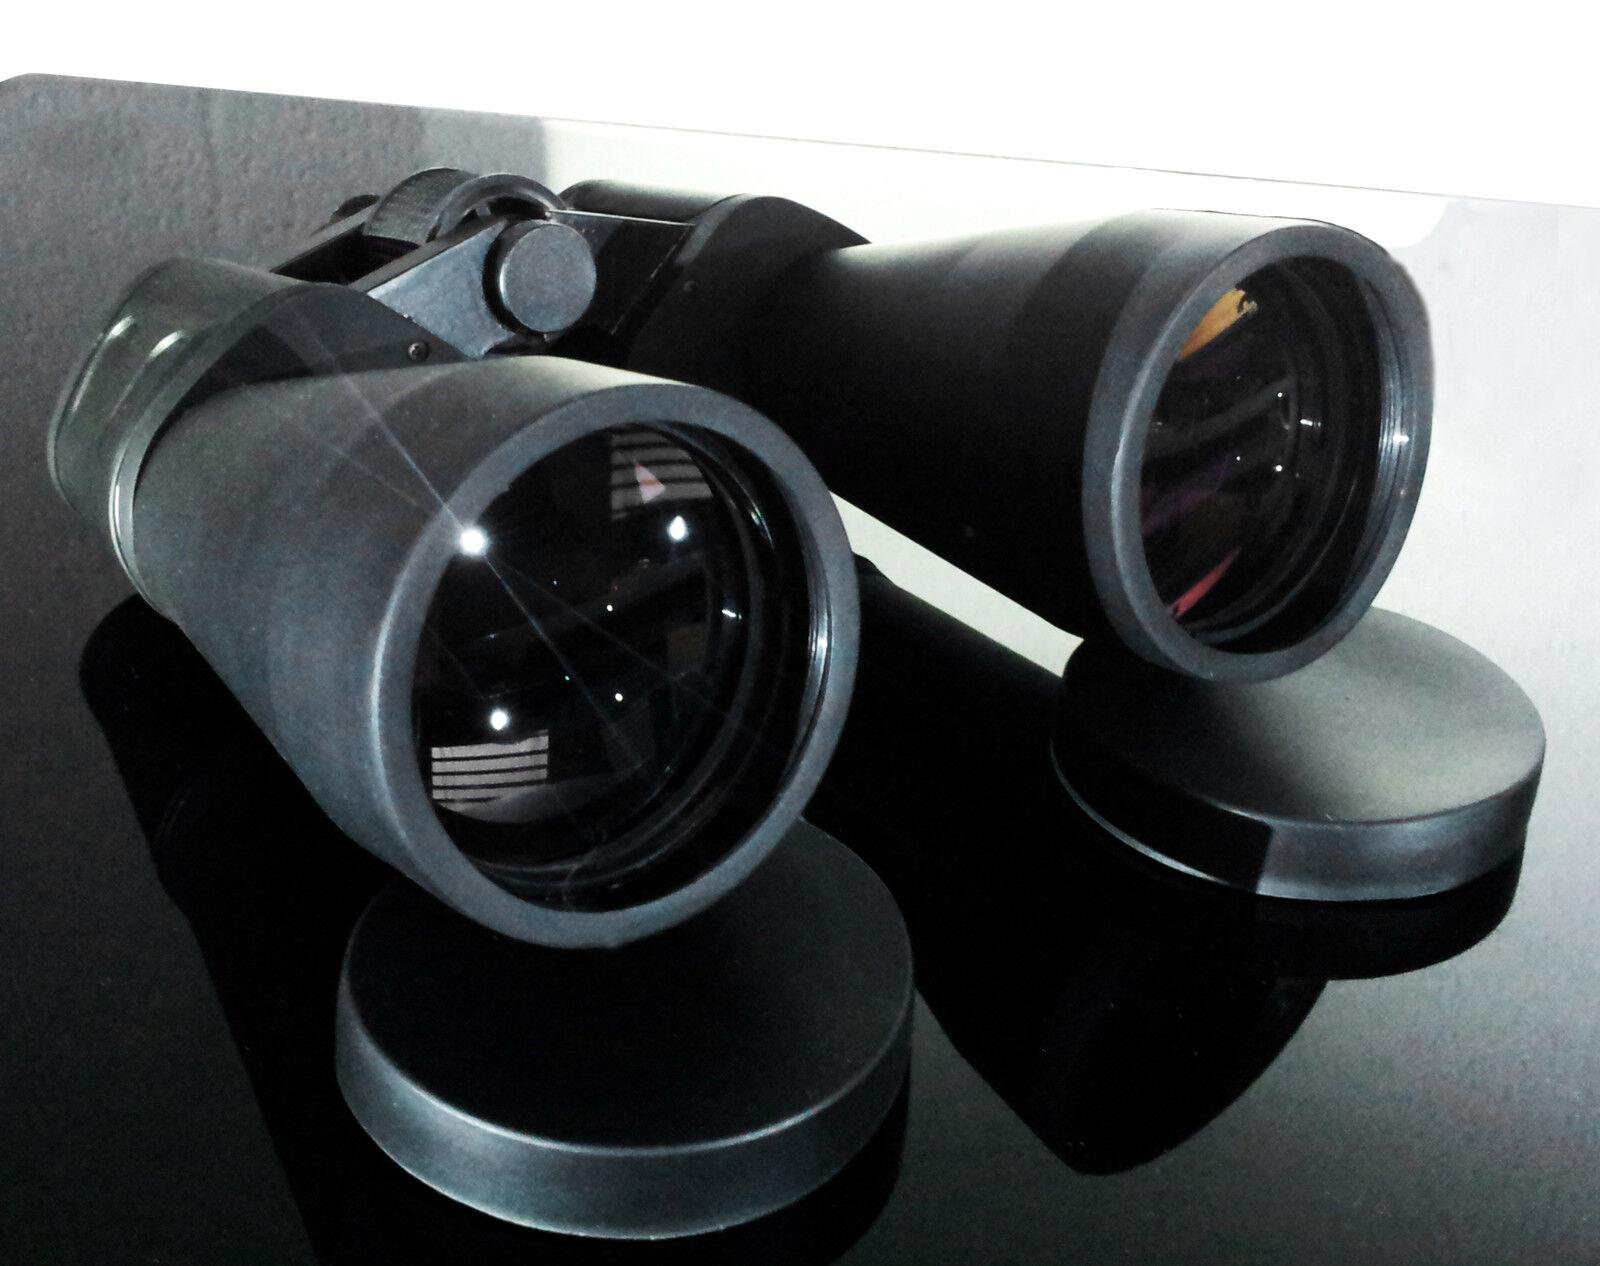 Zoom comet fernglas feldstecher spektiv jagdfernglas